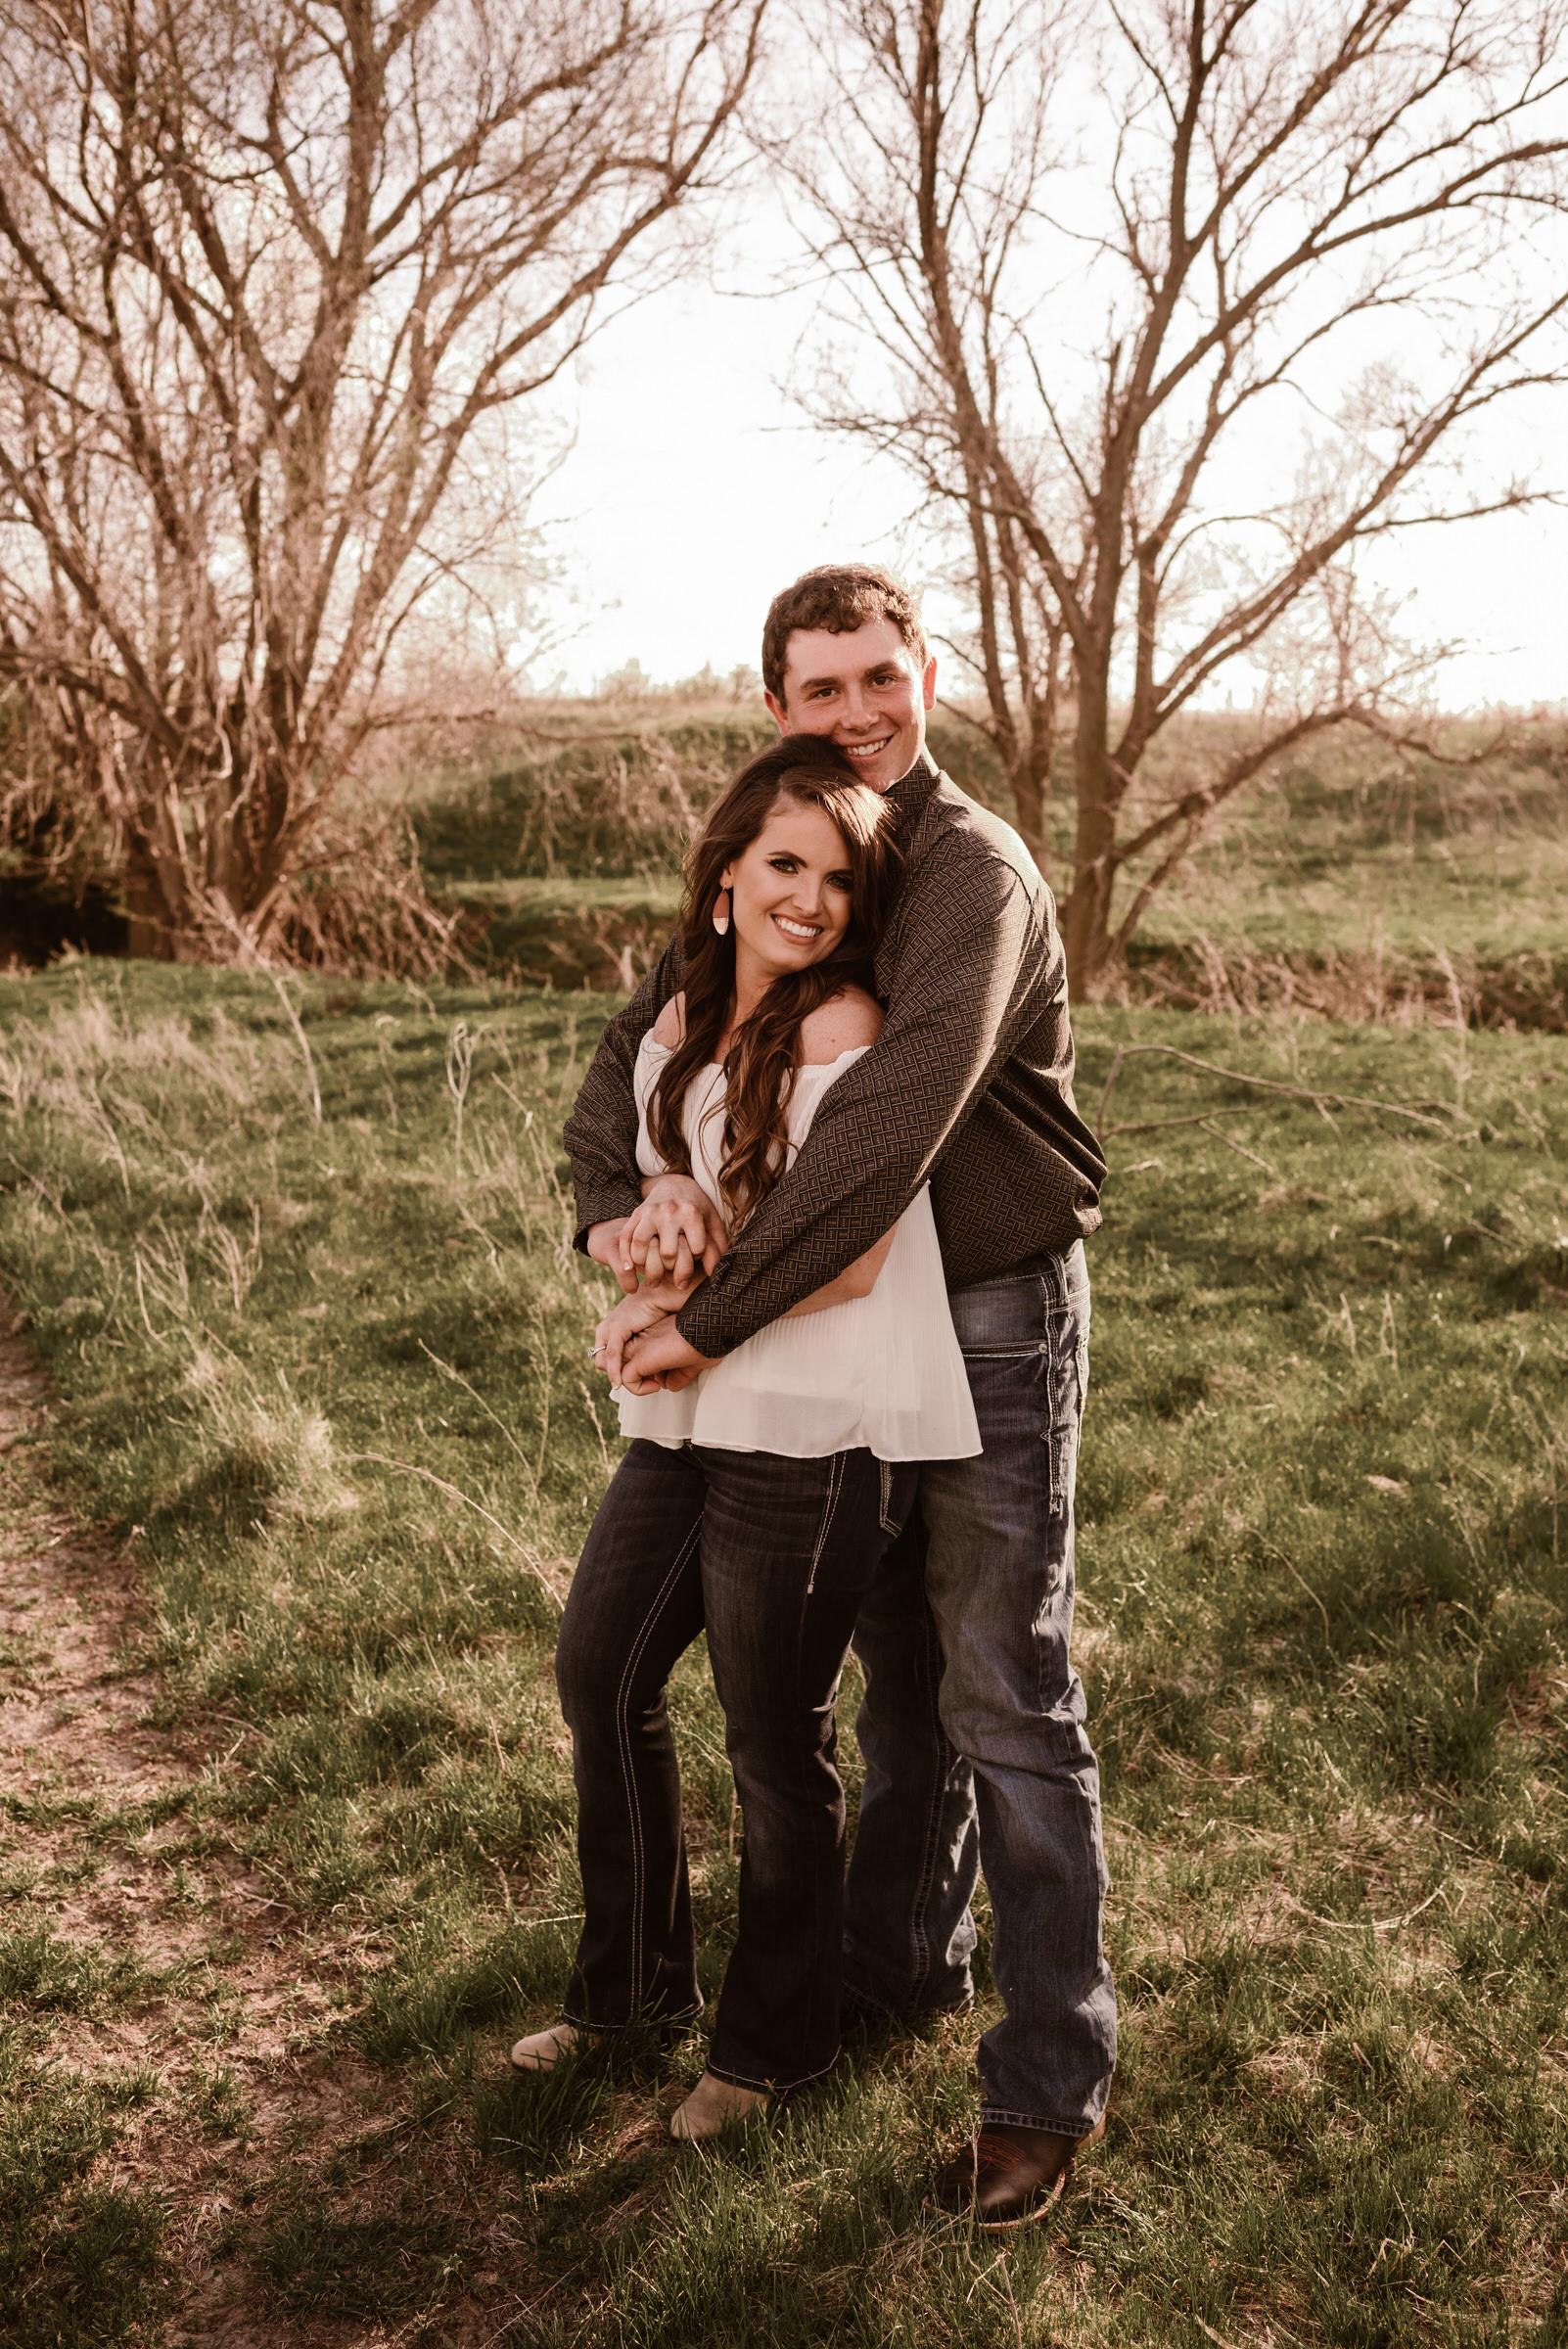 Sandhills-Nebraska-Engagement-Wedding-Photographer-Kaylie-Sirek-Photography-002.jpg